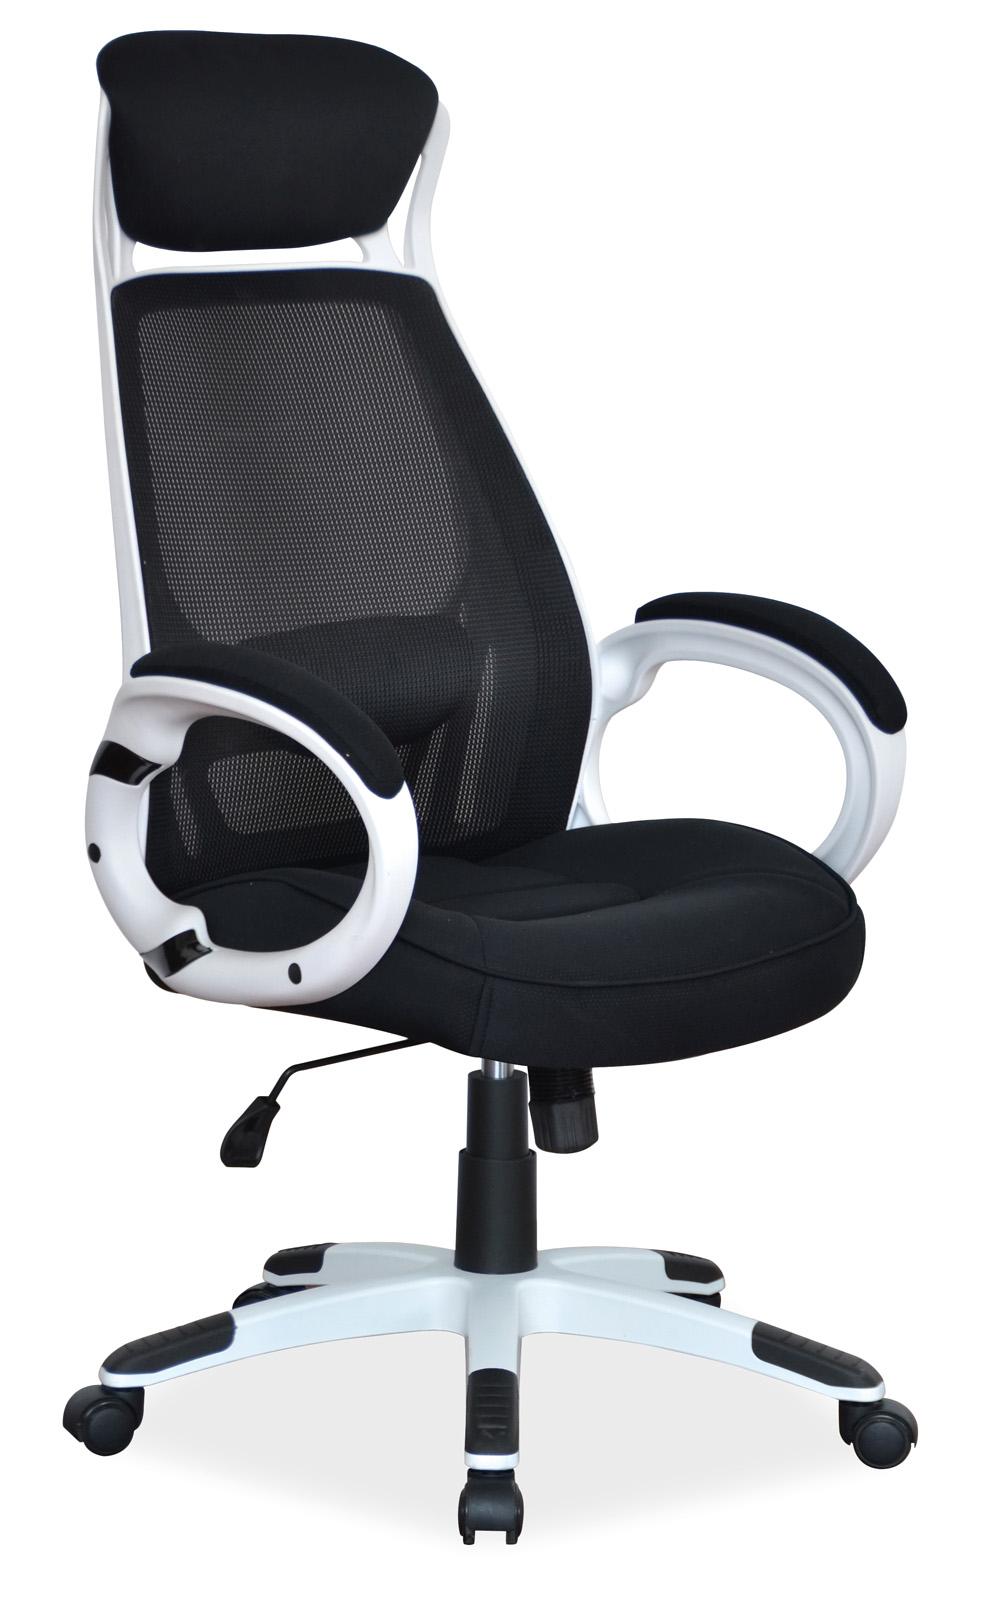 Scaun de birou ergonomic tapitat cu stofa Q-409 Black / White, l63xA51xH117-127 cm imagine